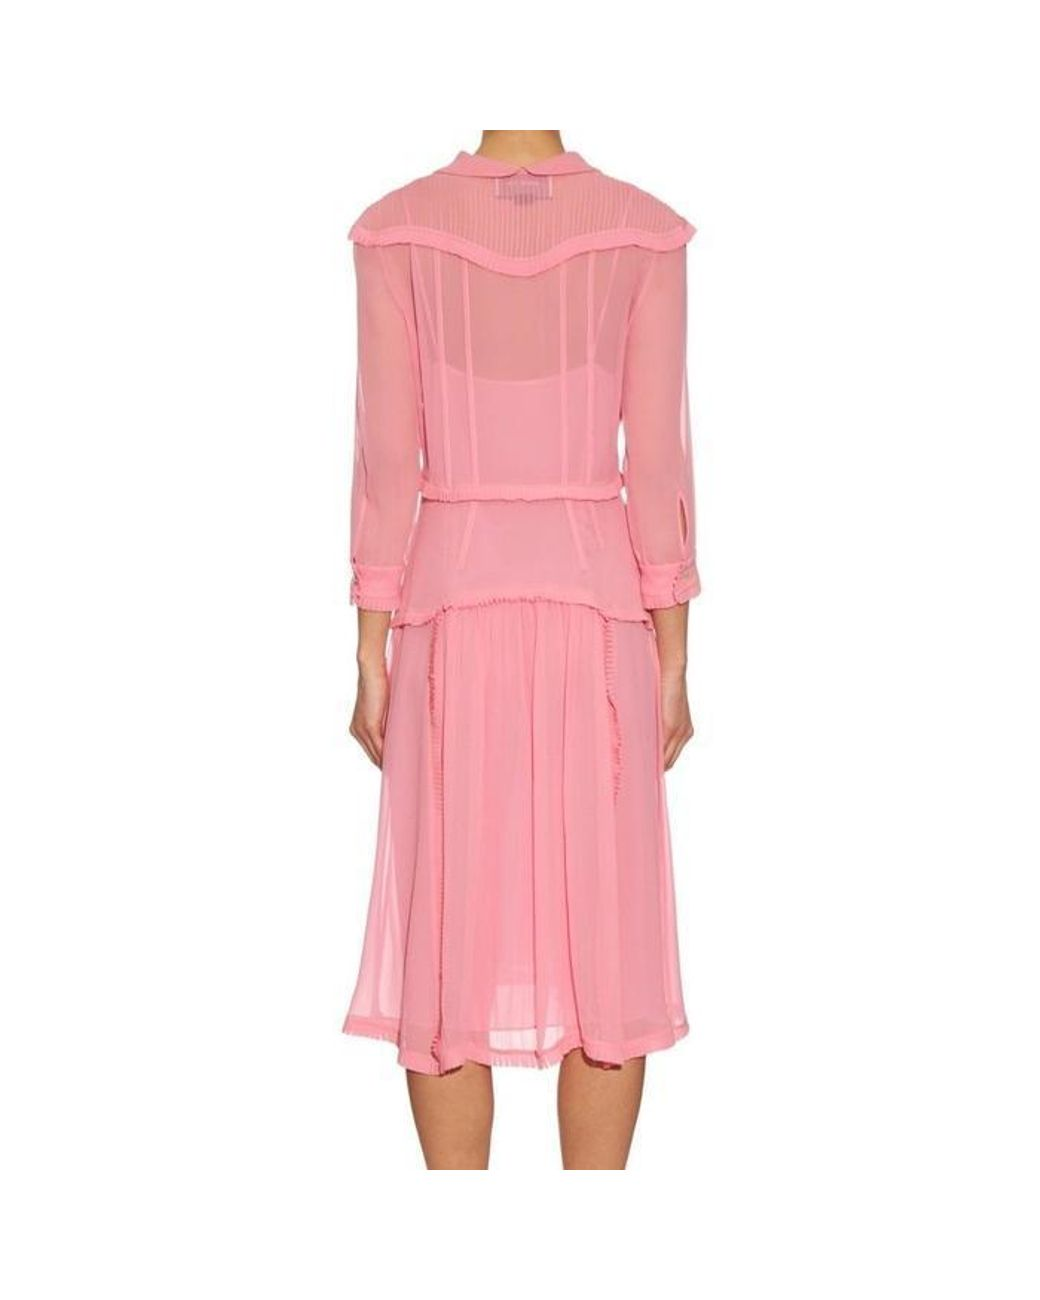 0d2c0d12625 Gucci Pink Ruffle Trimmed Silk Georgette Dress in Pink - Lyst